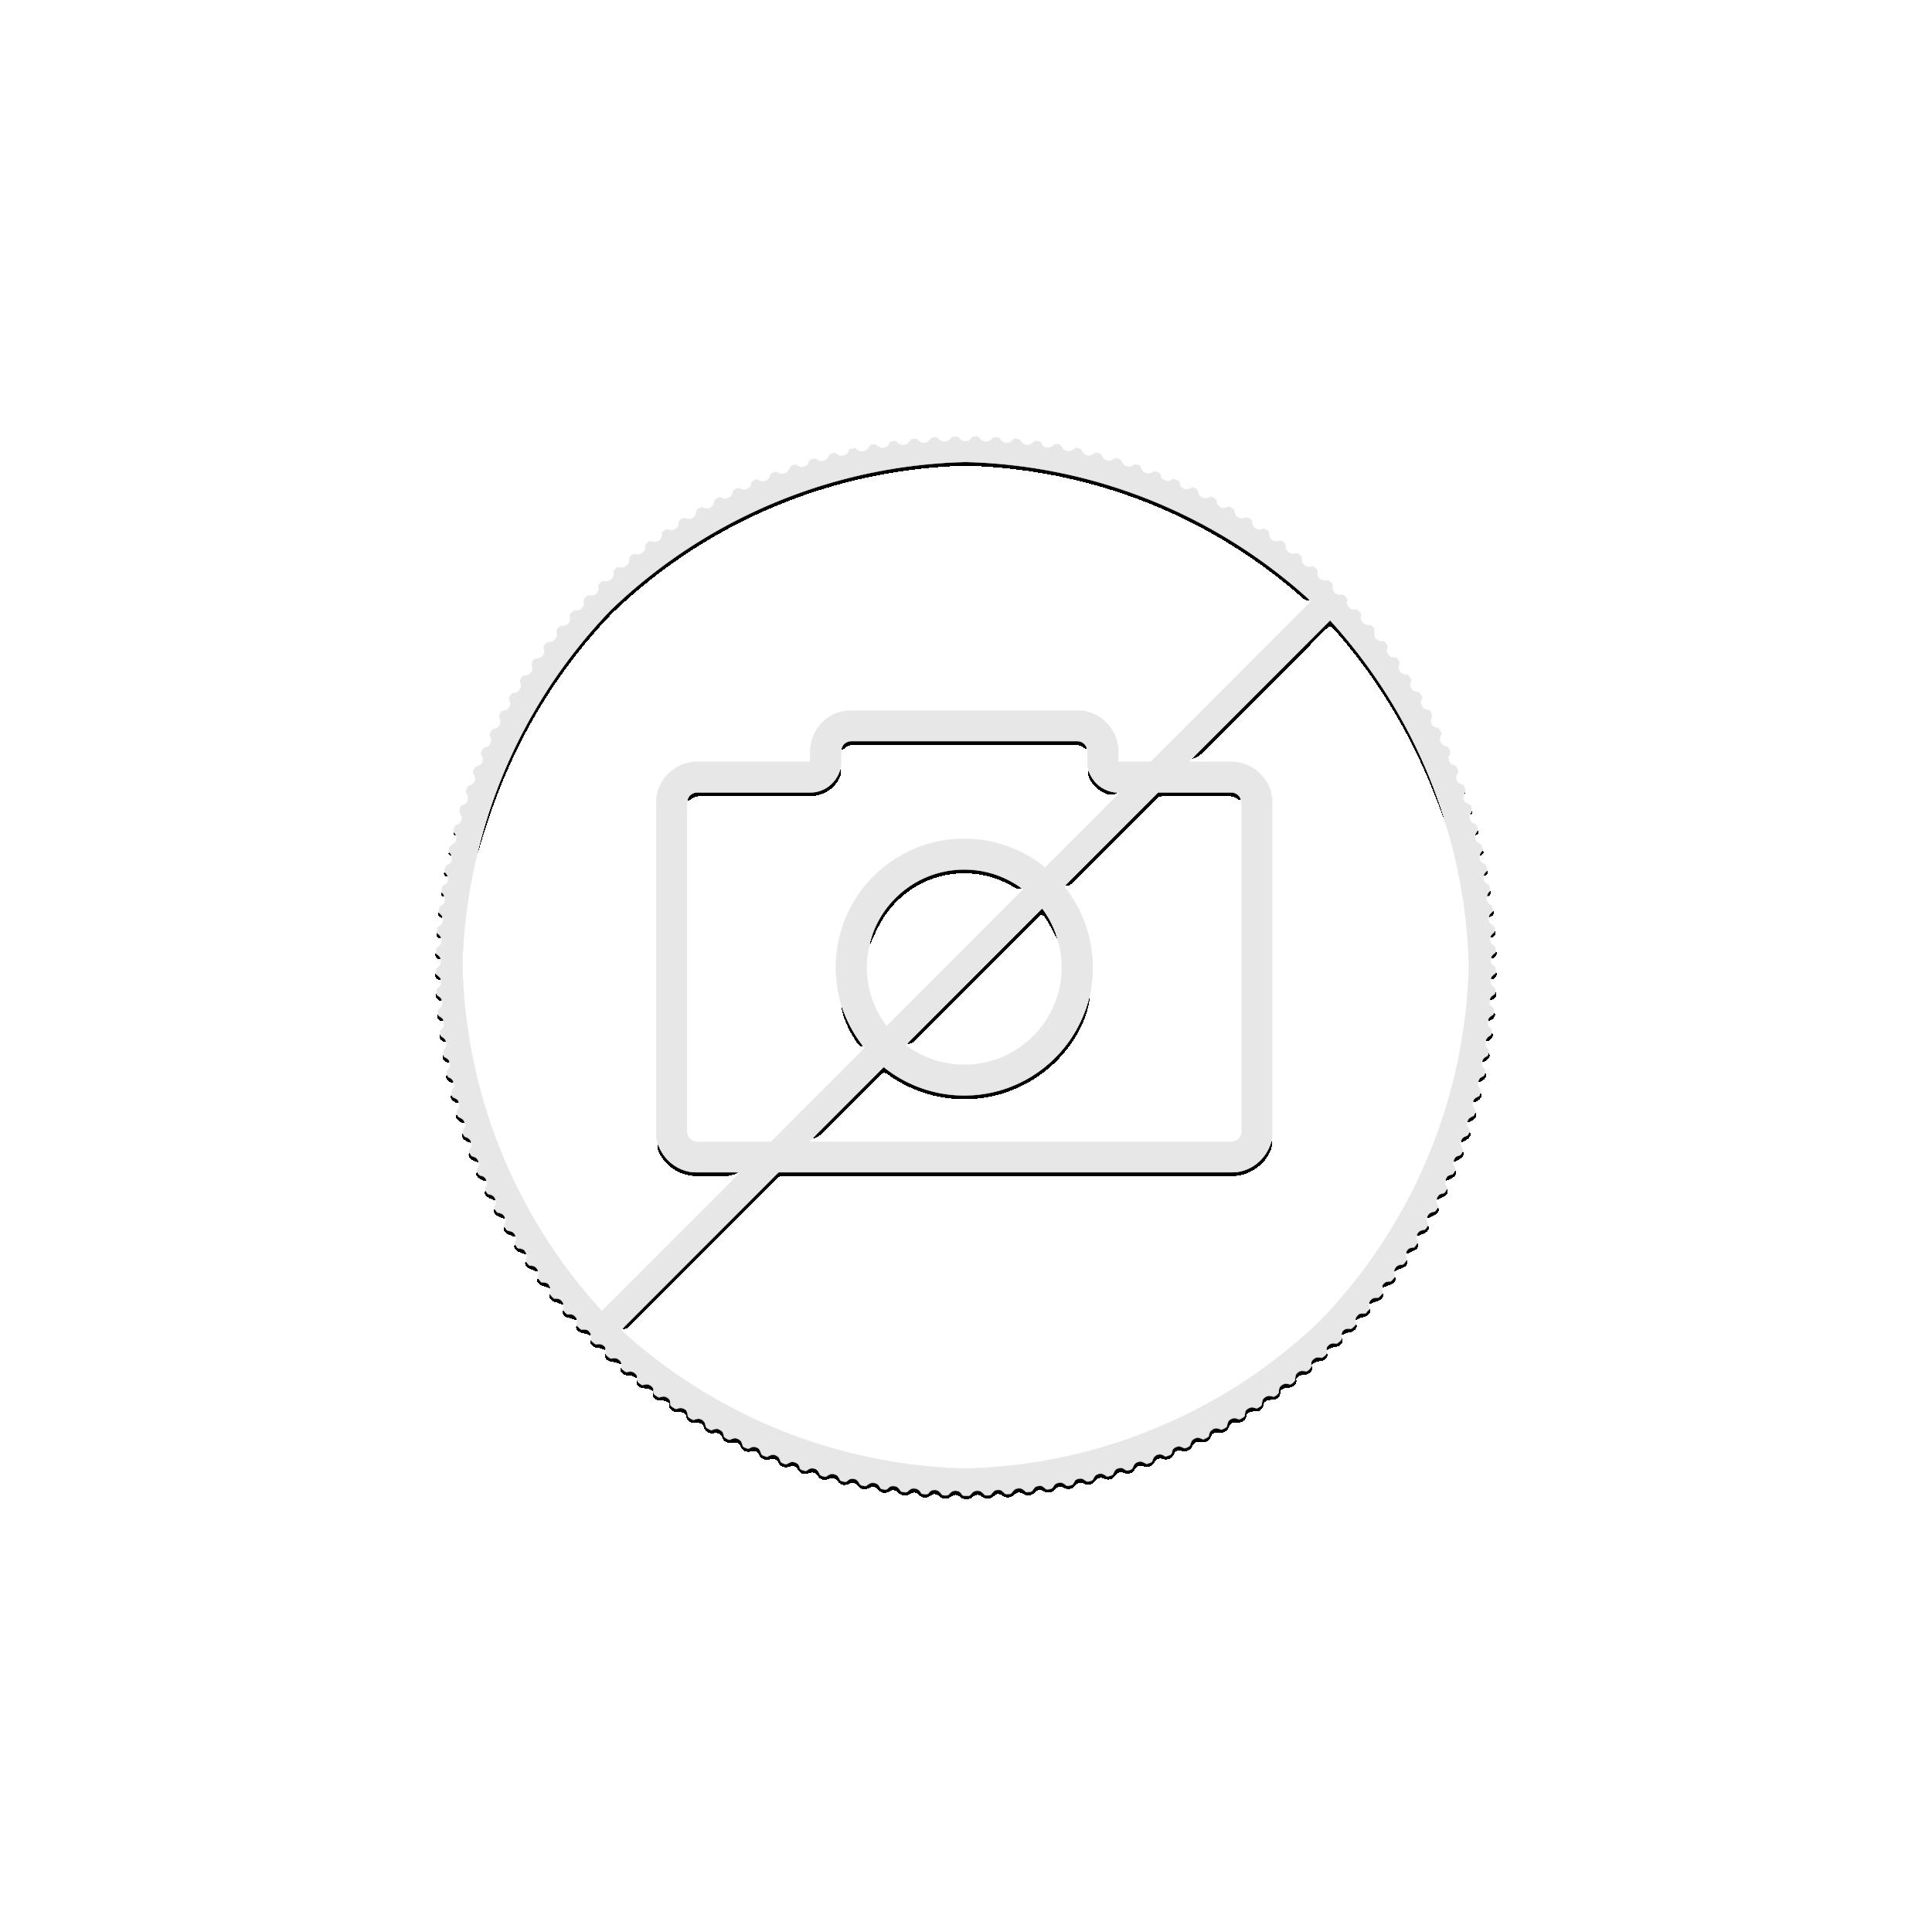 1 troy ounce silver Koala coin 2017